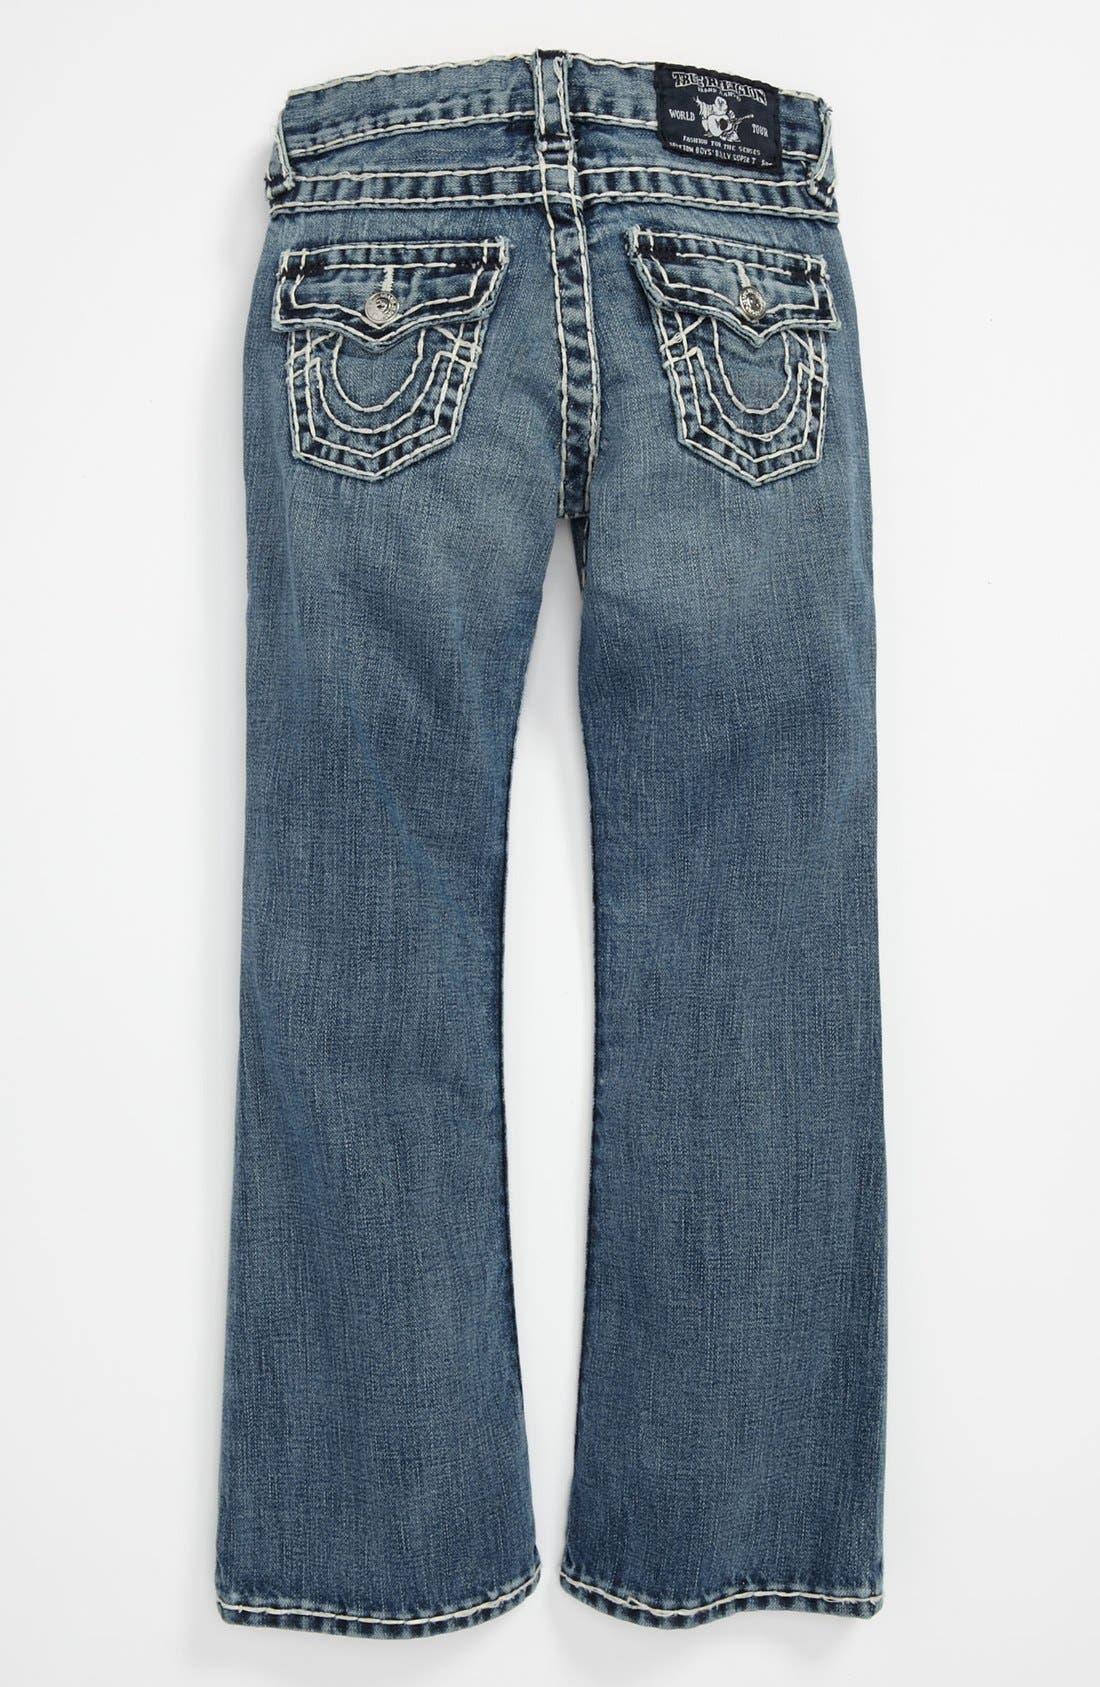 Alternate Image 1 Selected - True Religion Brand Jeans 'Billy Super T' Jeans (Little Boys)